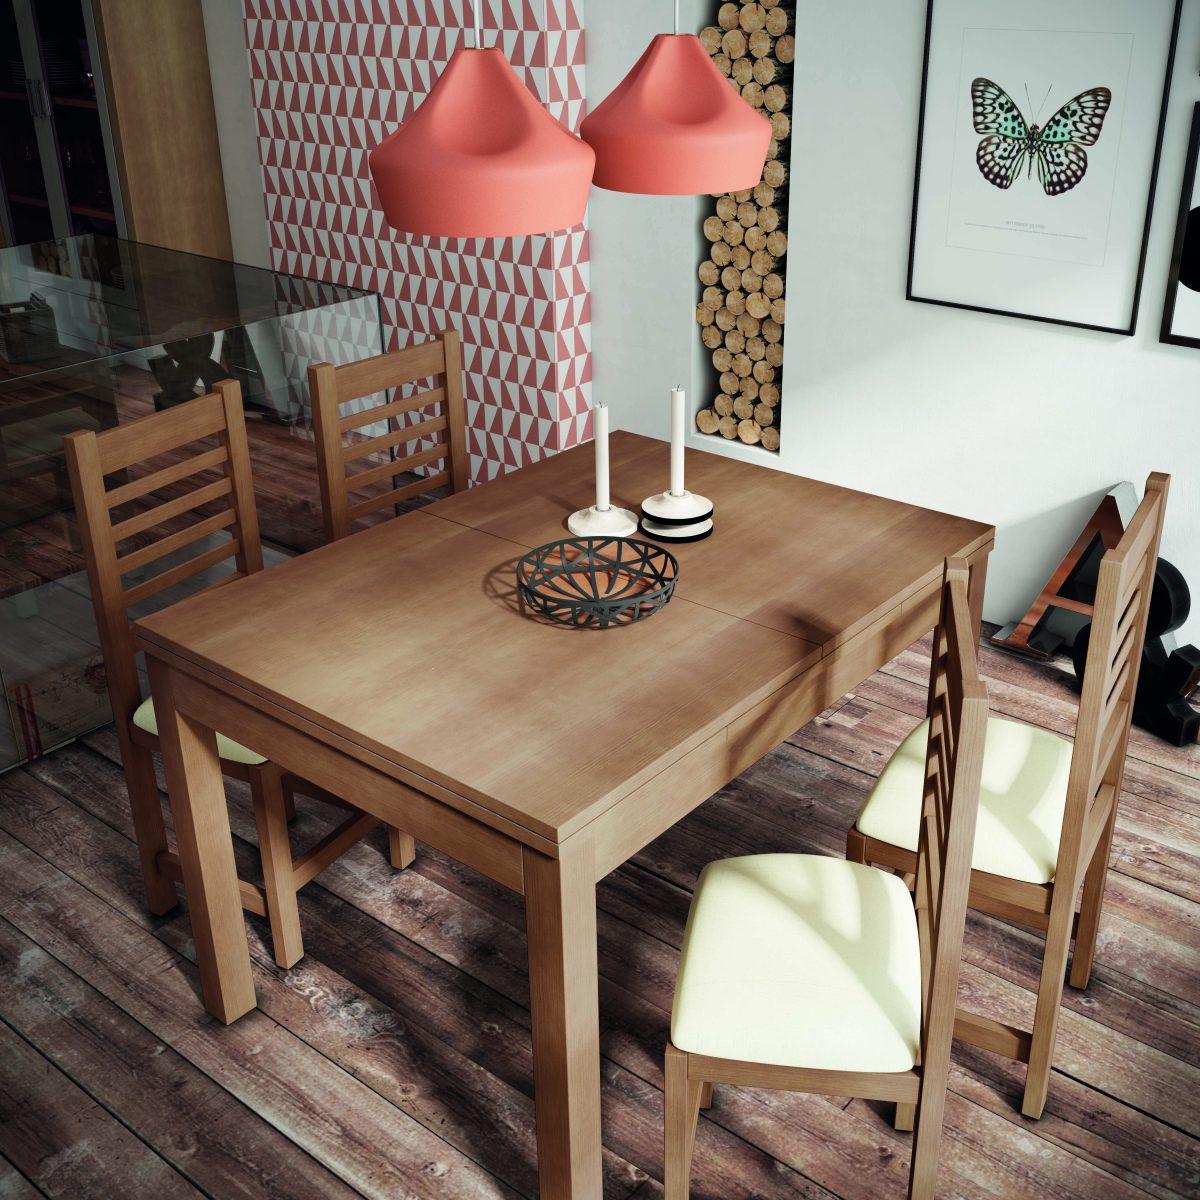 Mesa comedor de madera de 140x90 extensible a 210, funcional y práctica.